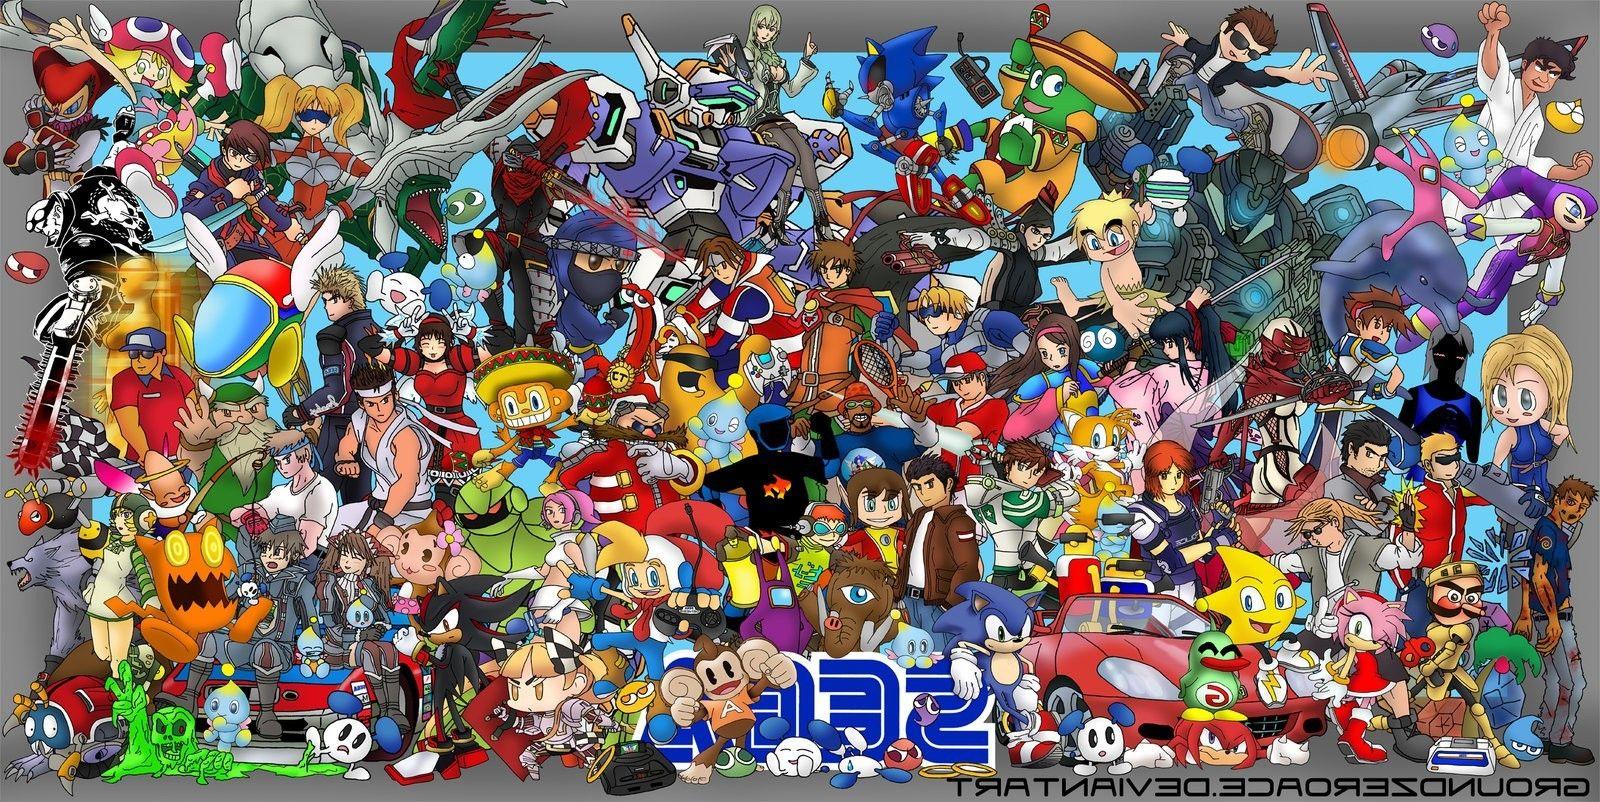 Sega Video Games Crossover Wallpaper Gaming Wallpapers Hd Gaming Wallpapers Hd Wallpaper